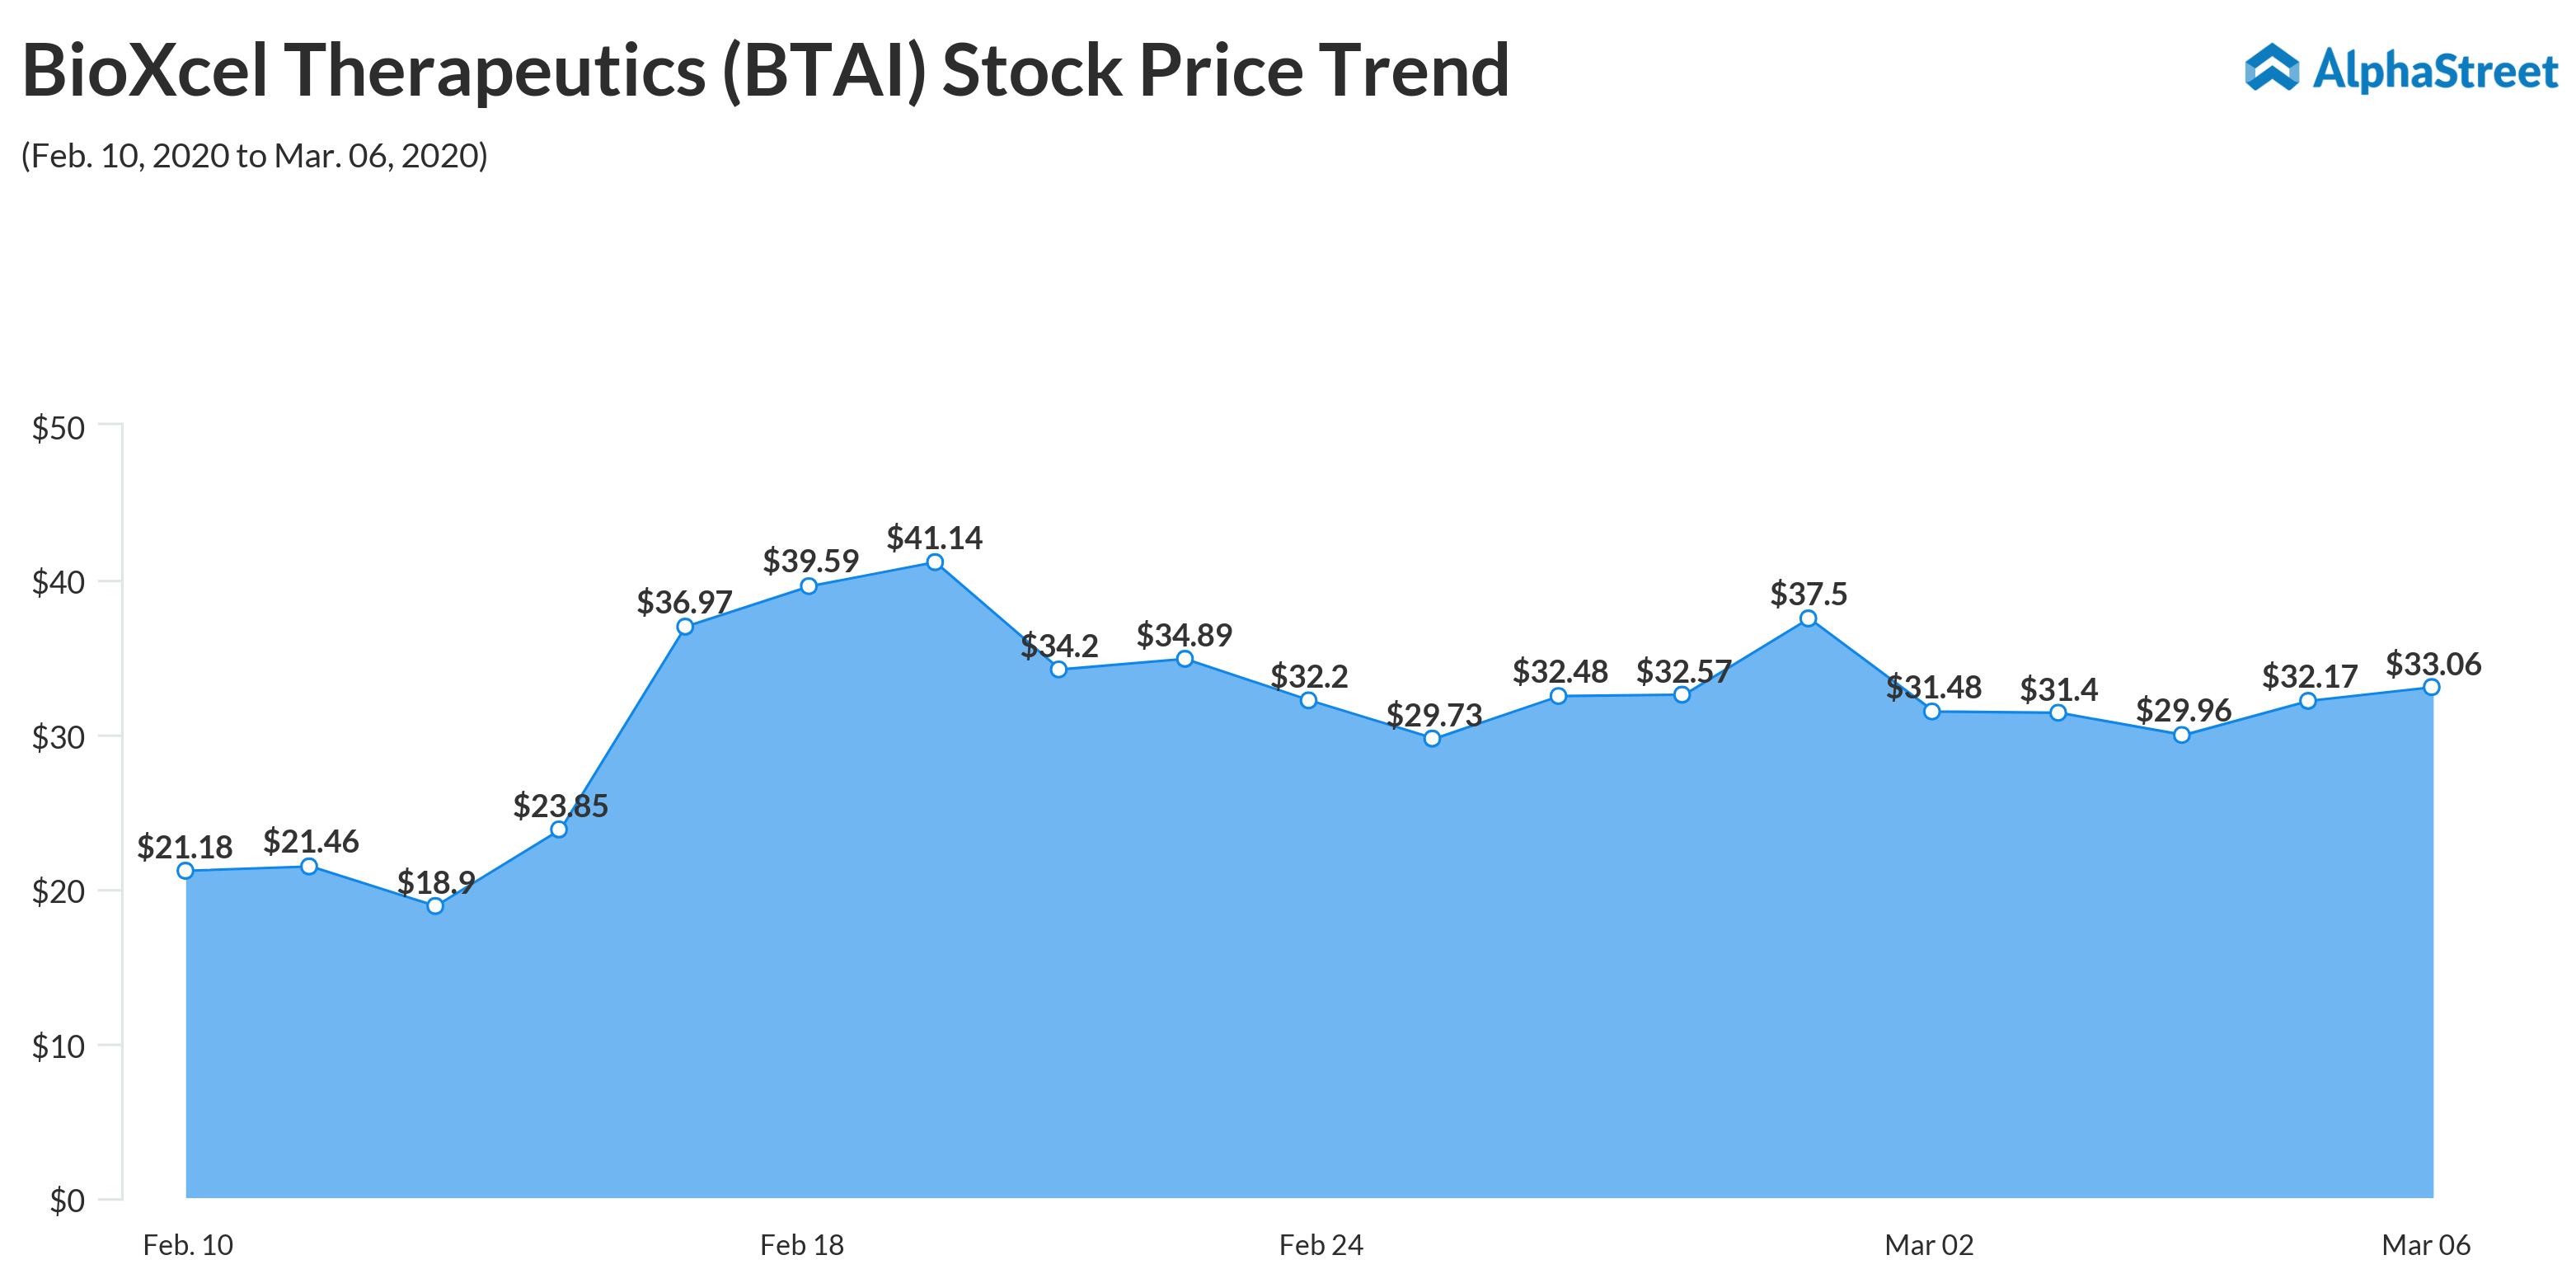 BioXcel Therapeutics (BTAI) Stock Price Trend